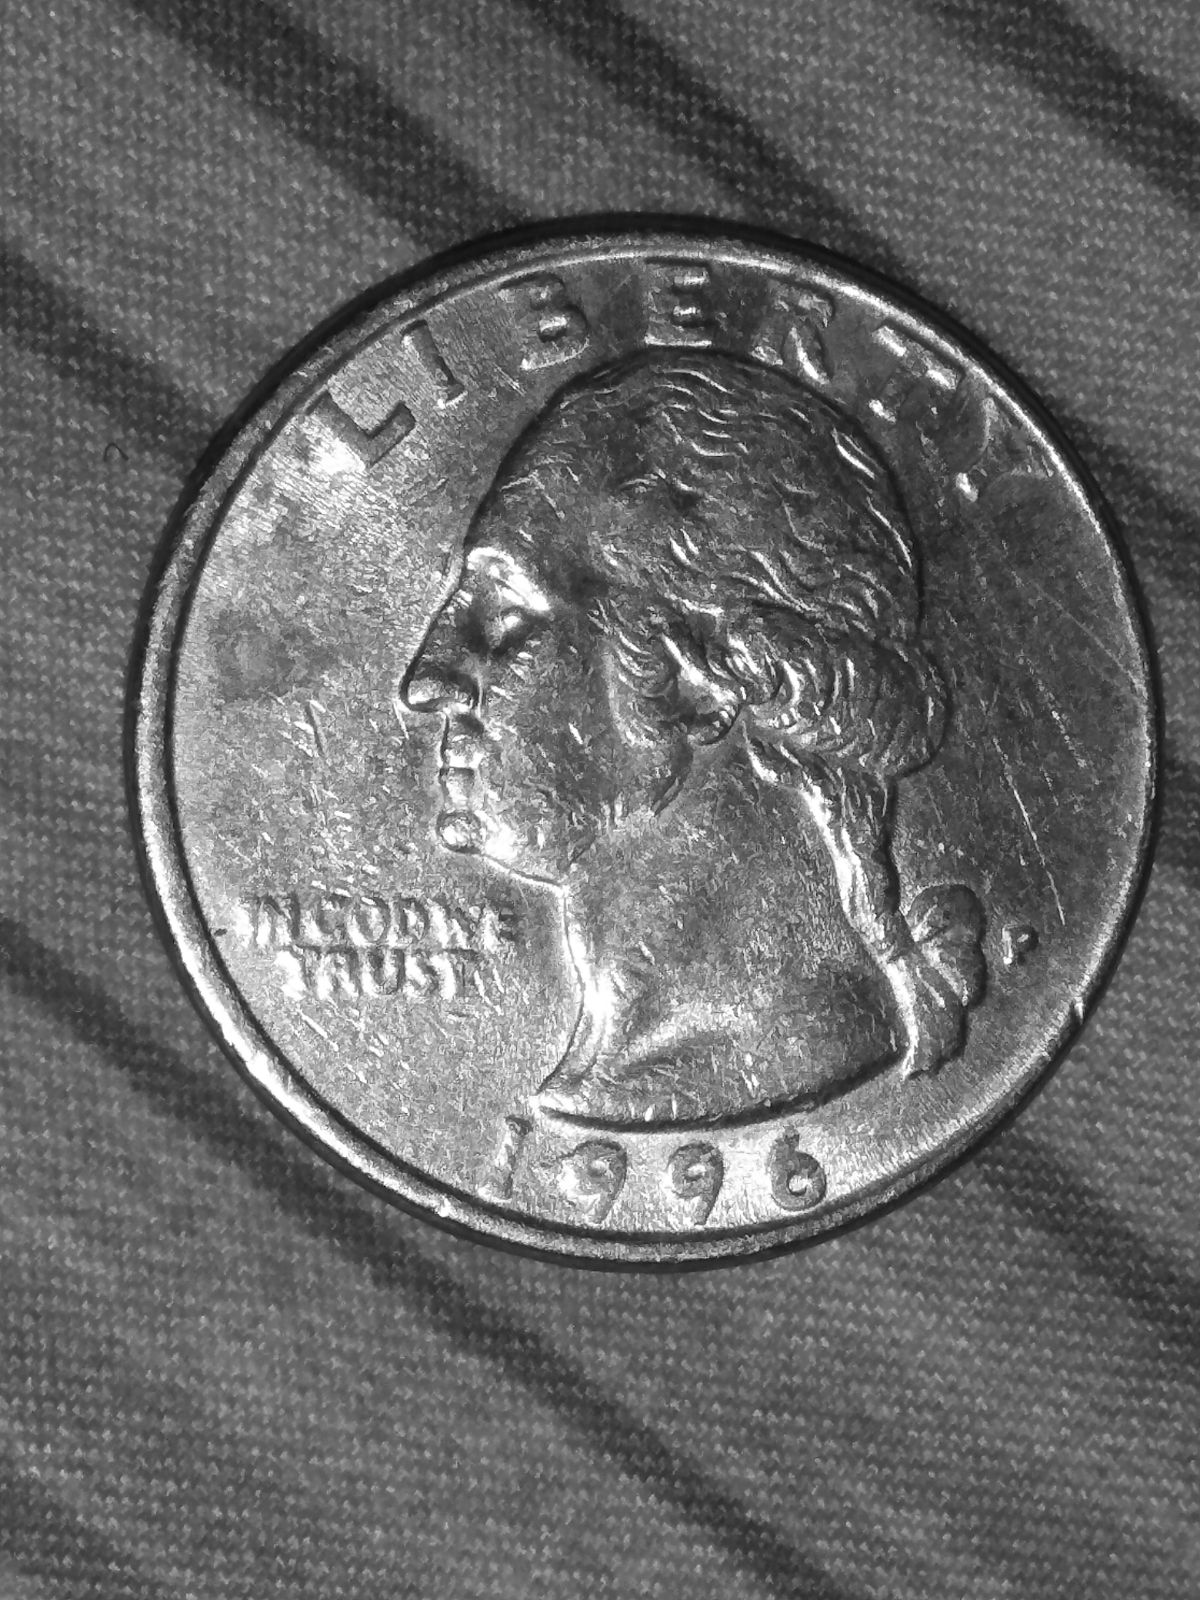 Error Coin 1996 P Missing Earlobe